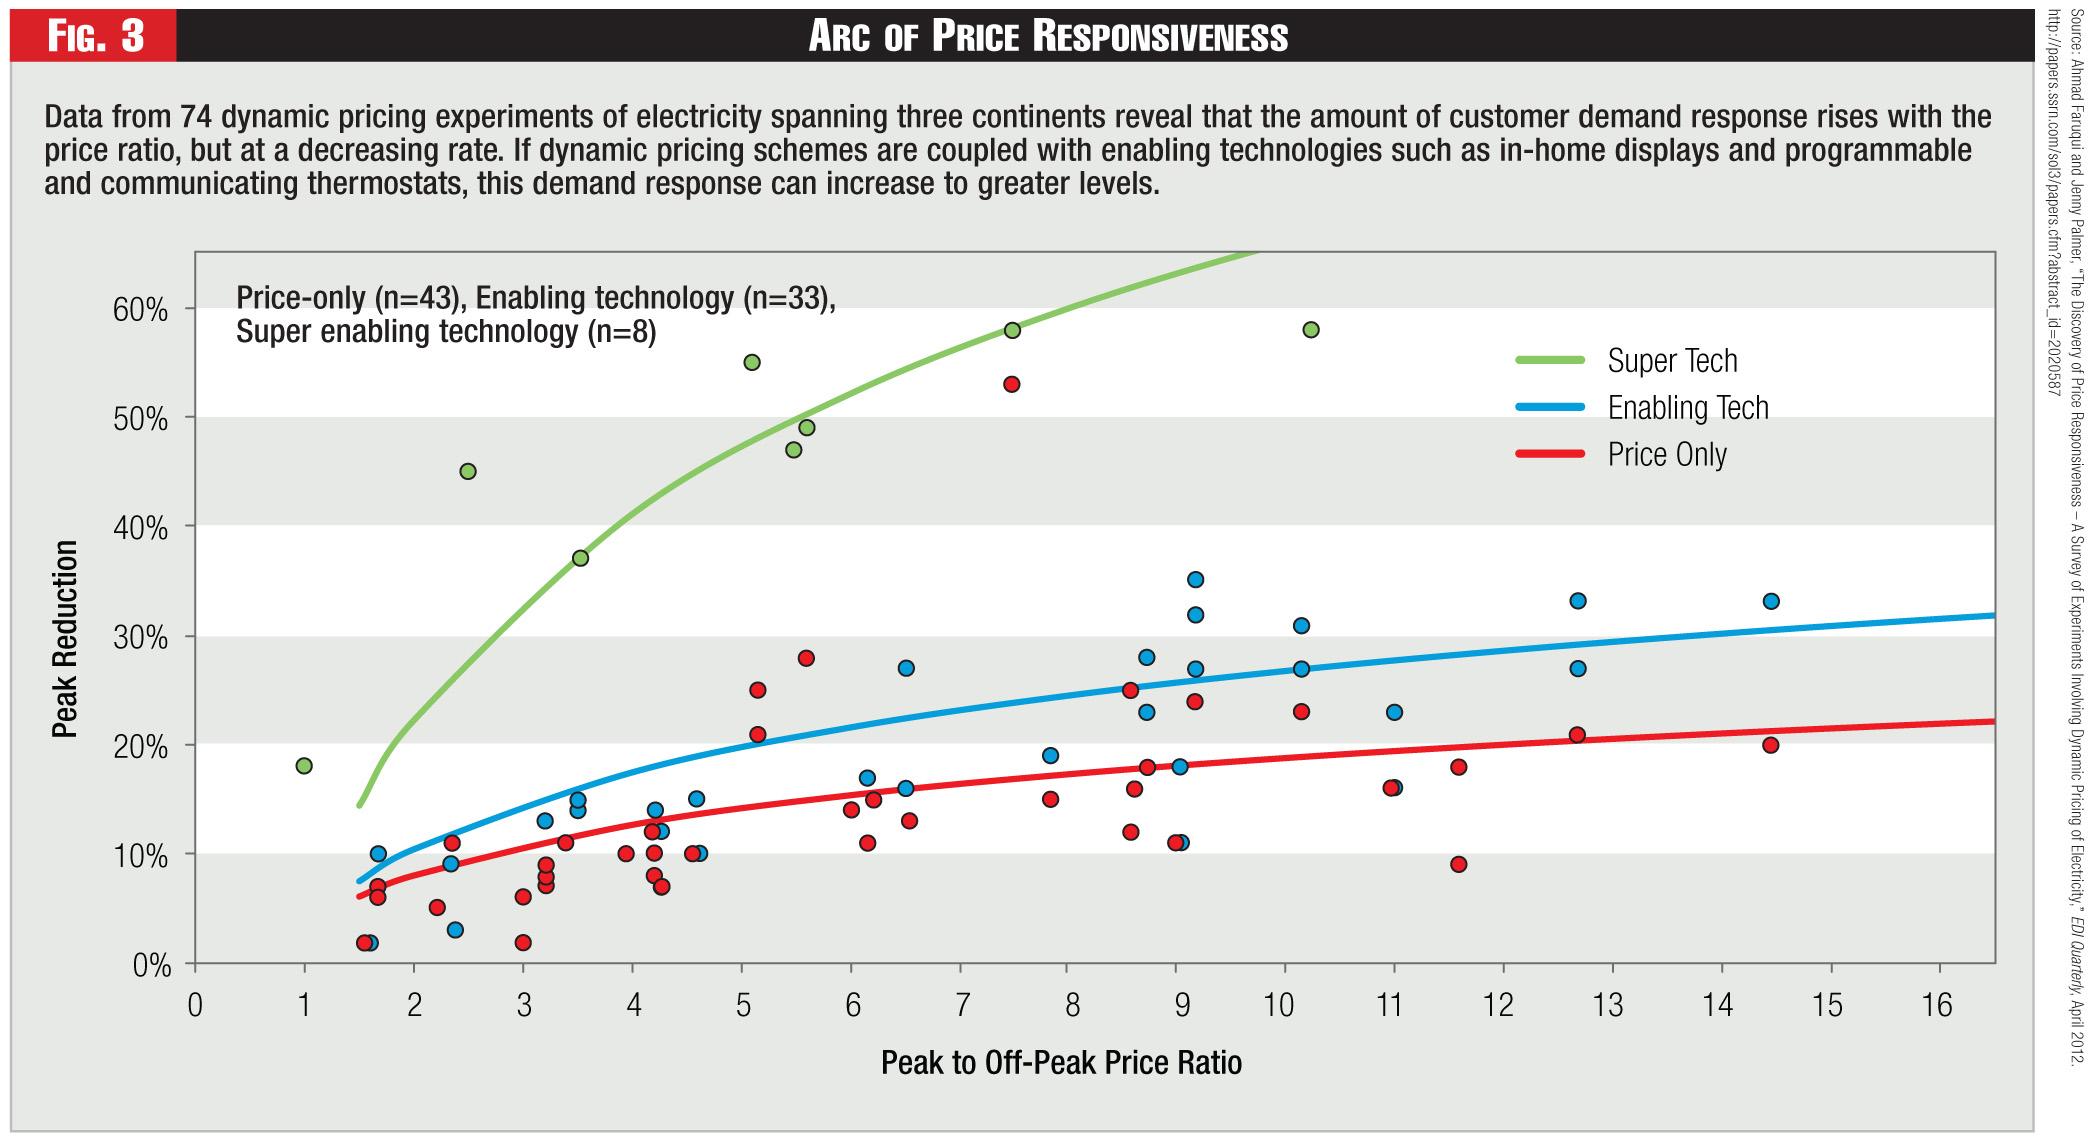 Figure 3 - Arc of Price Responsiveness